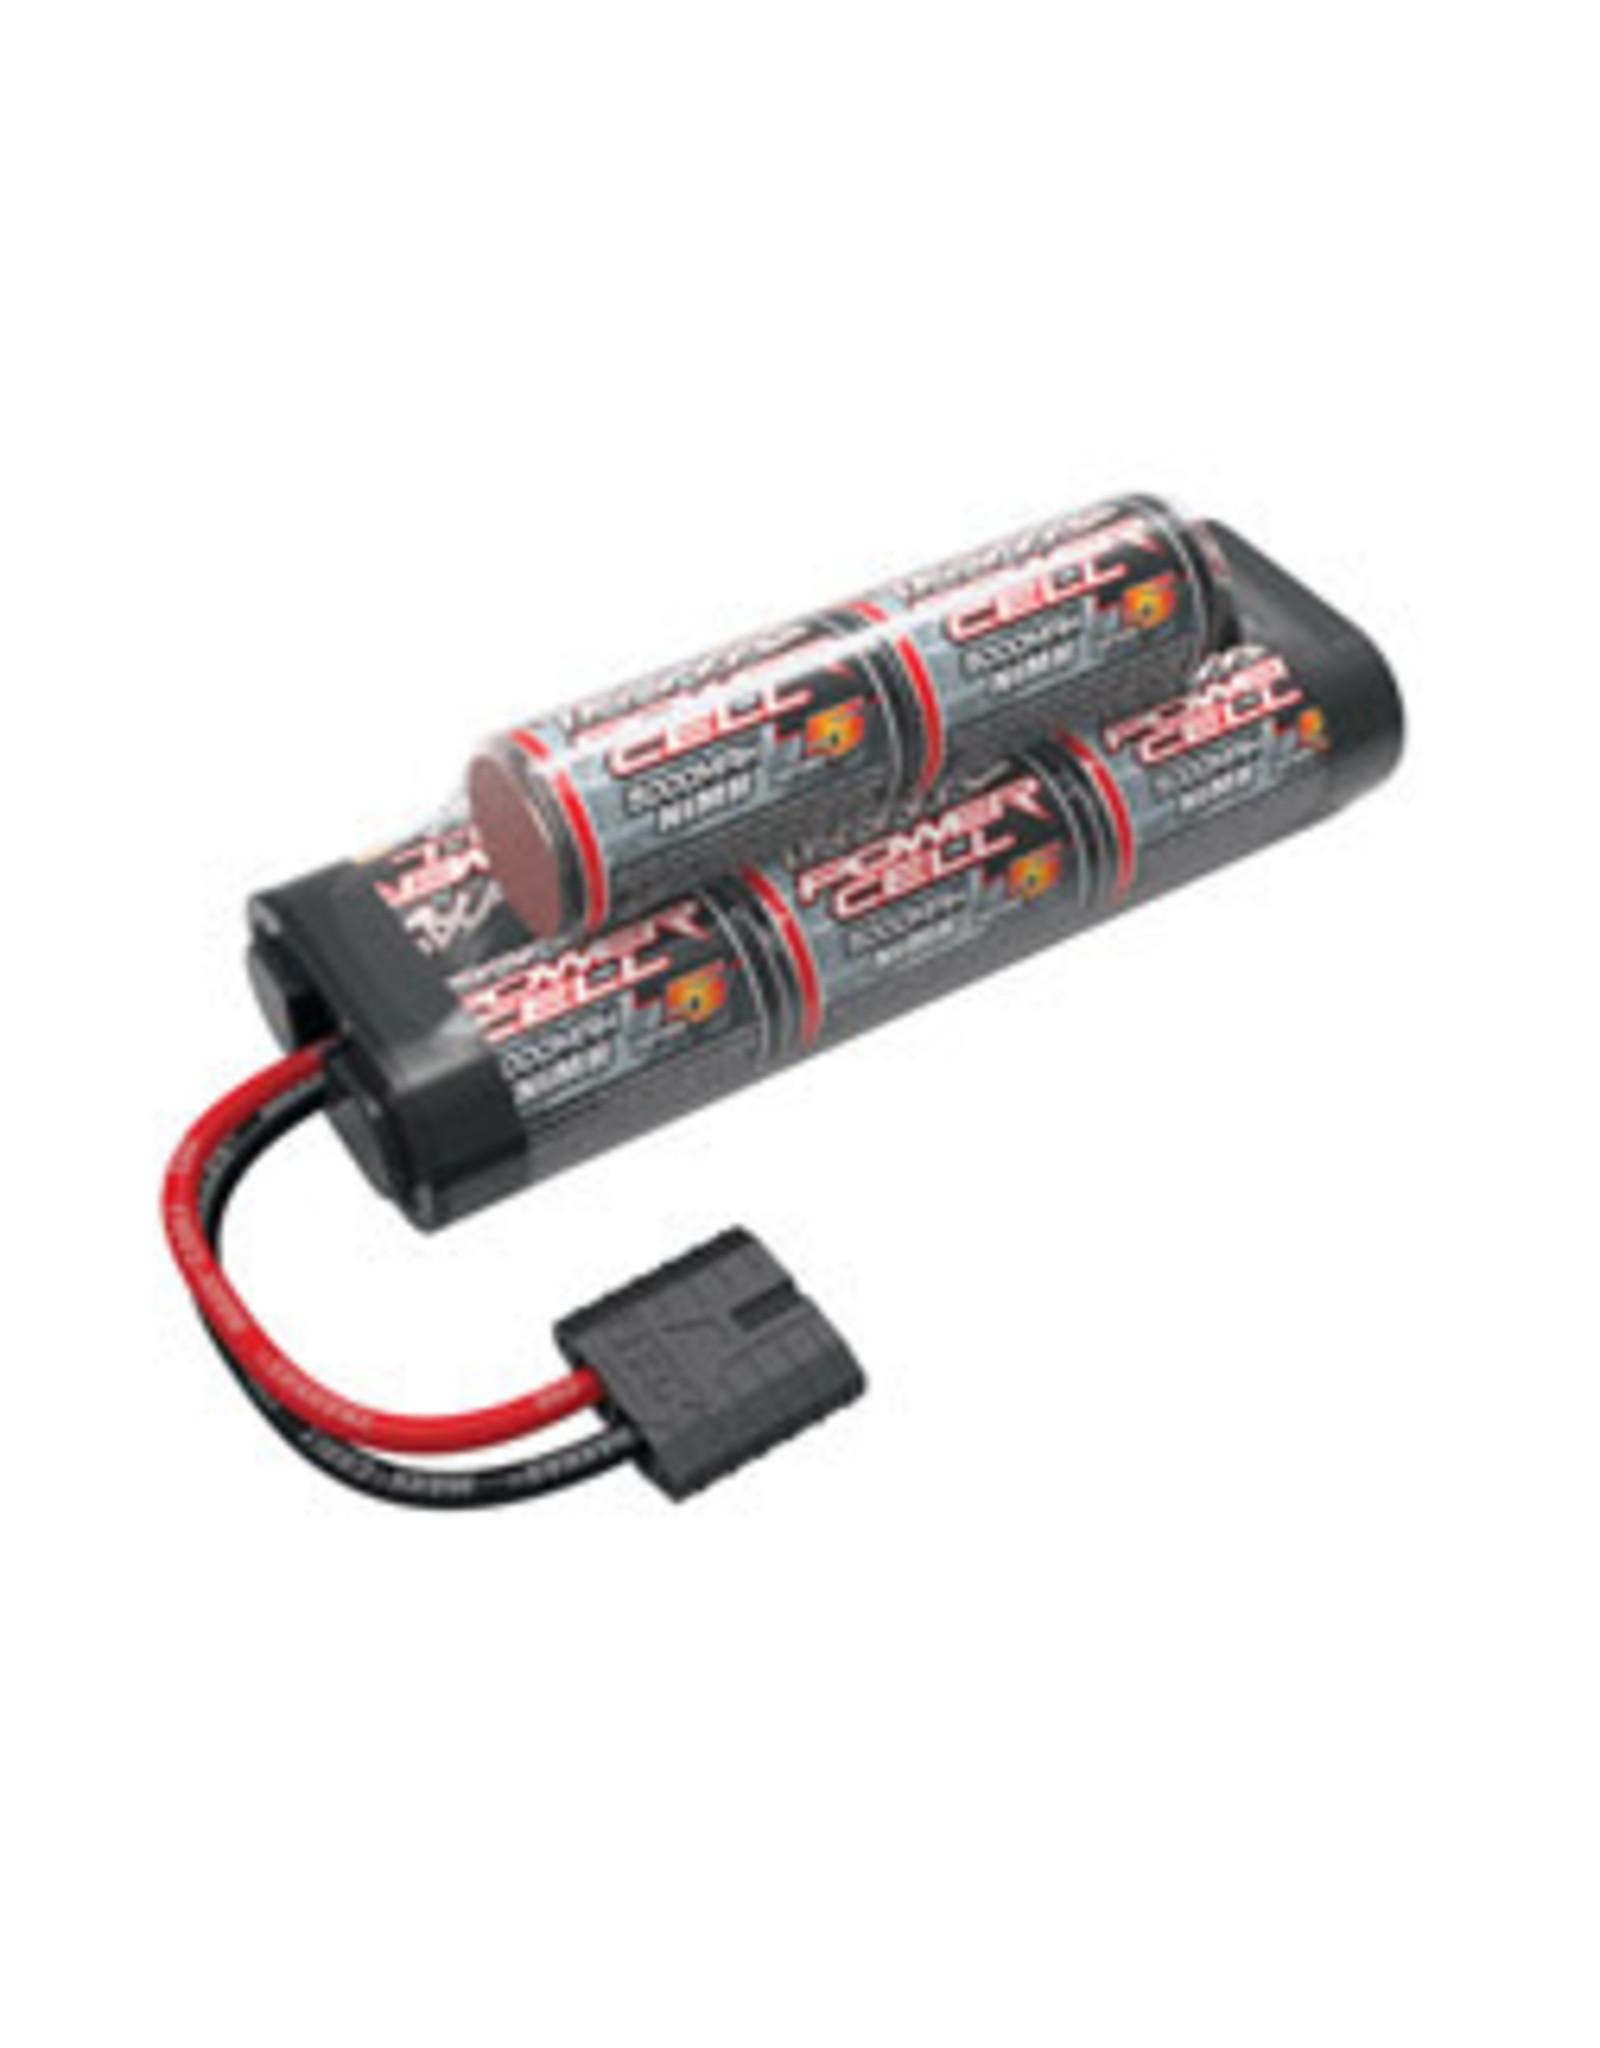 Traxxas [Battery, Series 5 Power Cell, 5000mAh (NiMH, 8-C hump, 9.6V)] Battery, Series 5 Power Cell, 5000mAh (NiMH, 8-C hump, 9.6V)